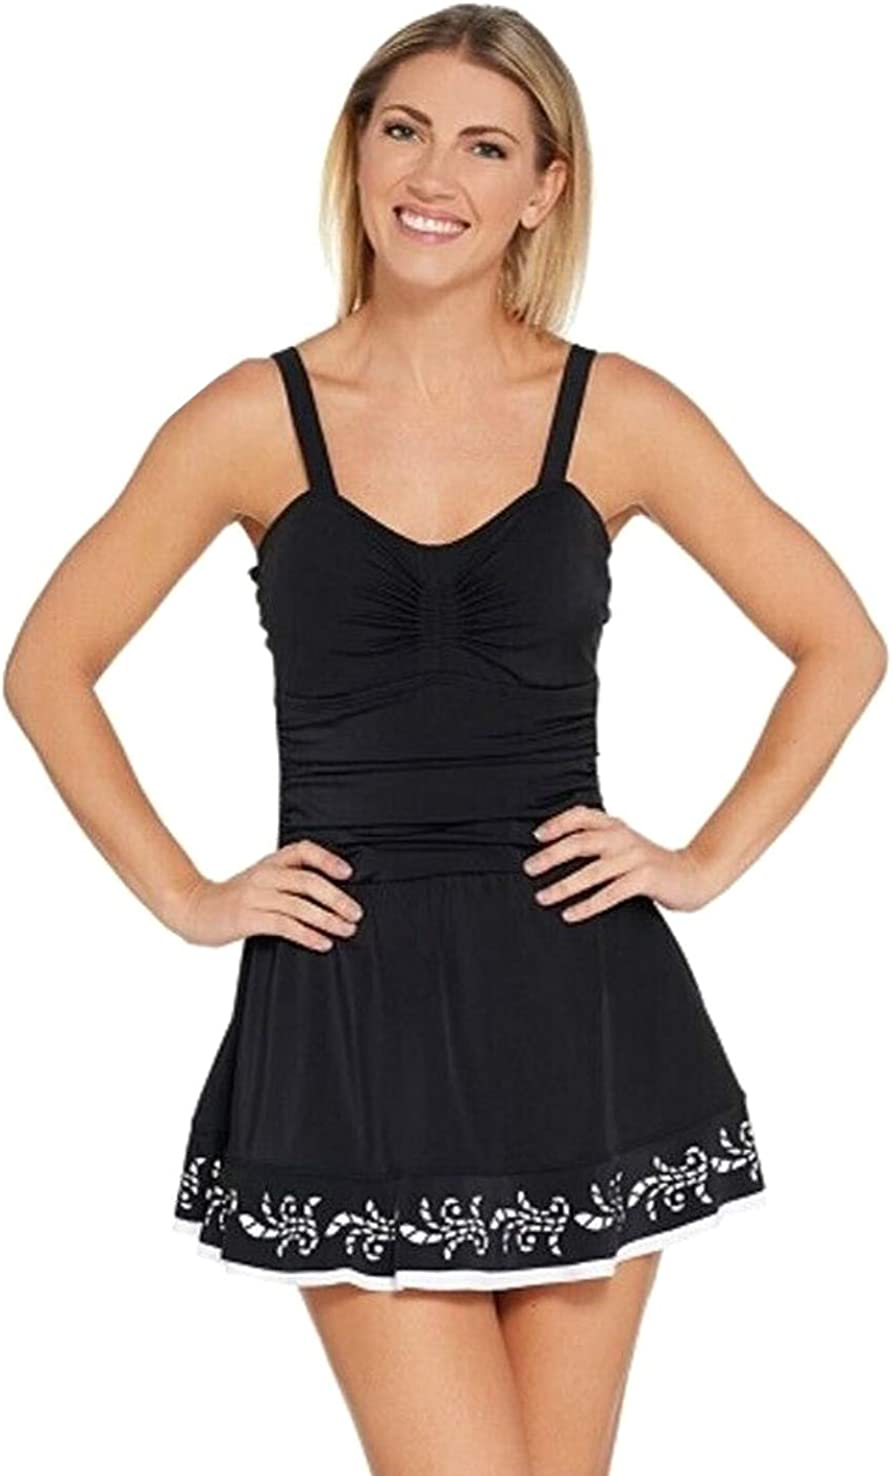 Denim & Co. Beach Ruched Laser Cut Hem Plus Size Swimdress Swimsuit